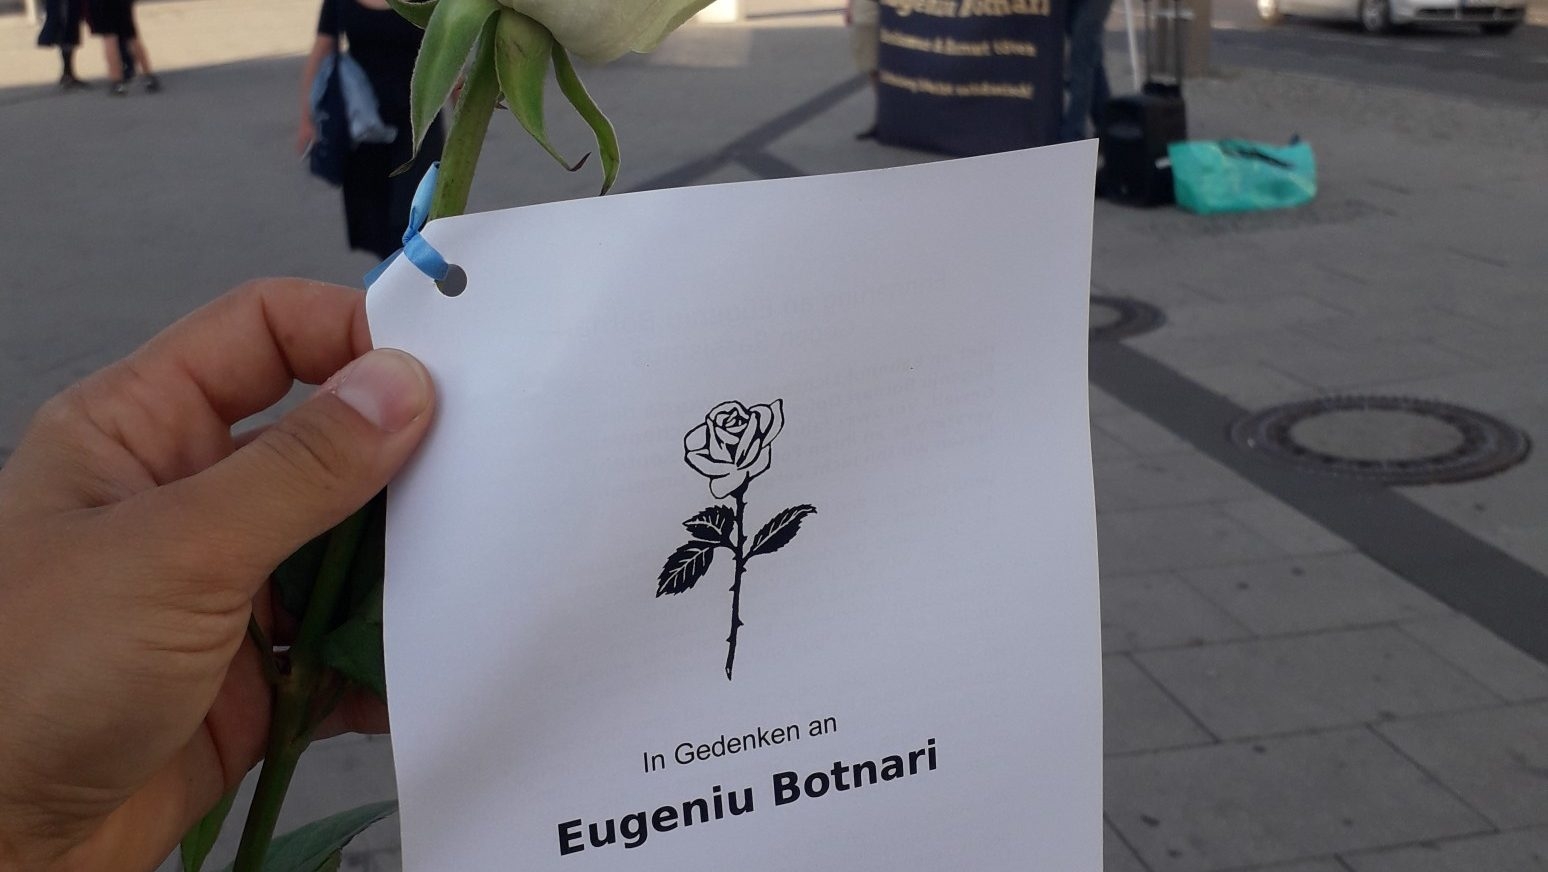 Gedenkkundgebung Botnari 2018 16:9